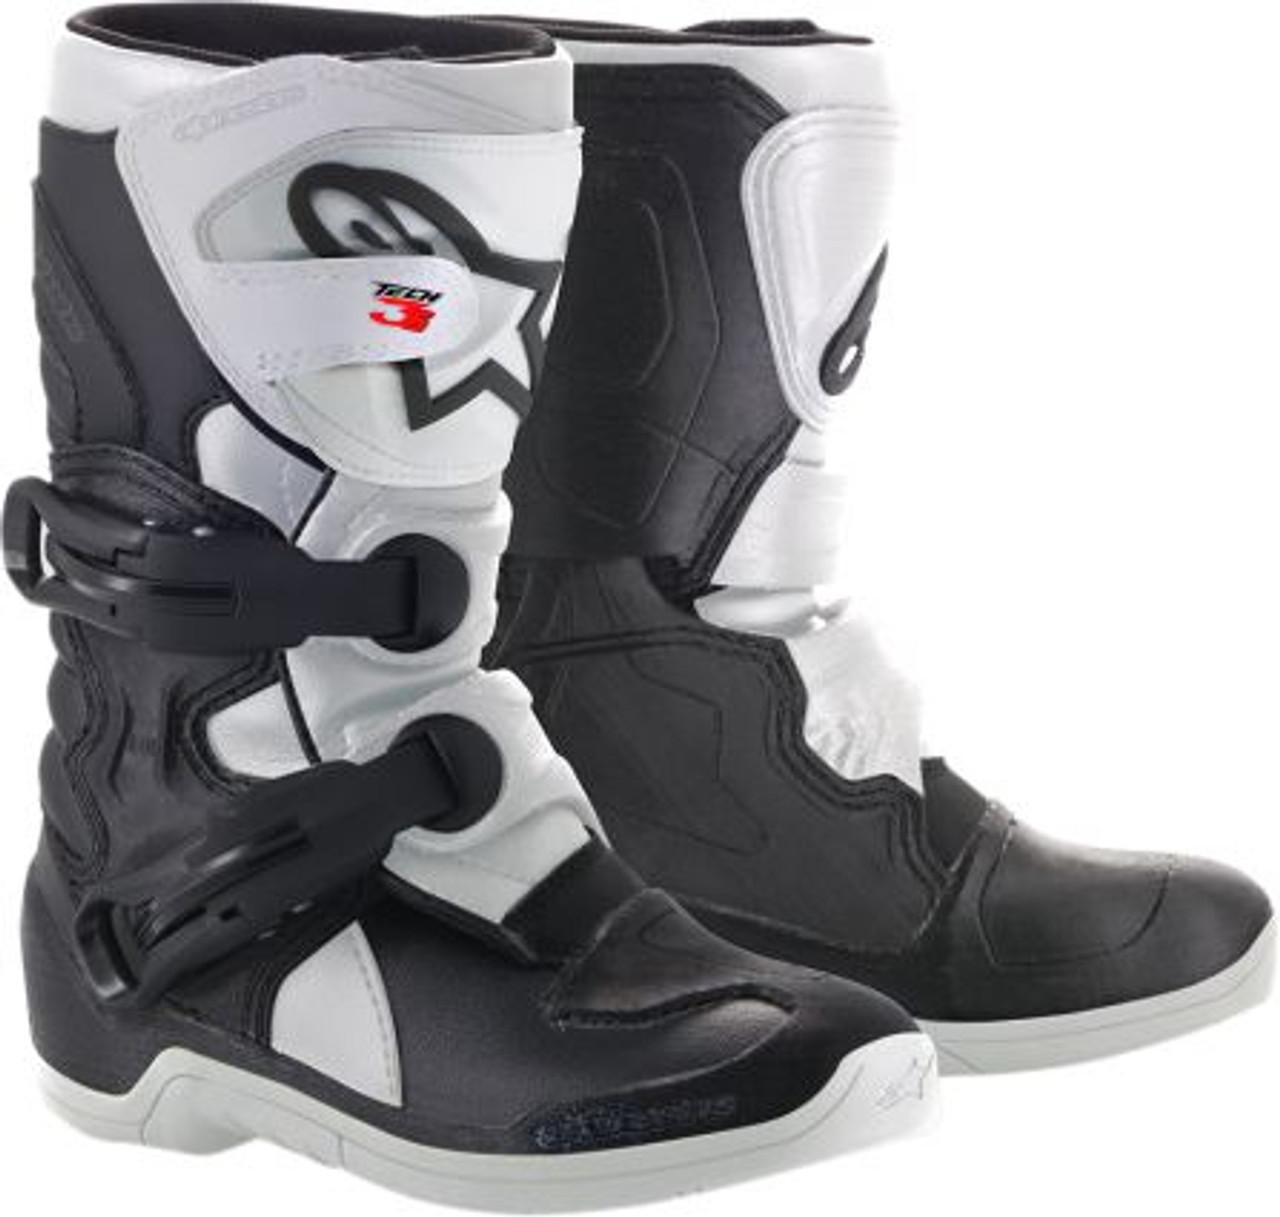 Choose Size Black//White Alpinestars MX//Motocross Kids 2018 TECH 3S Boots